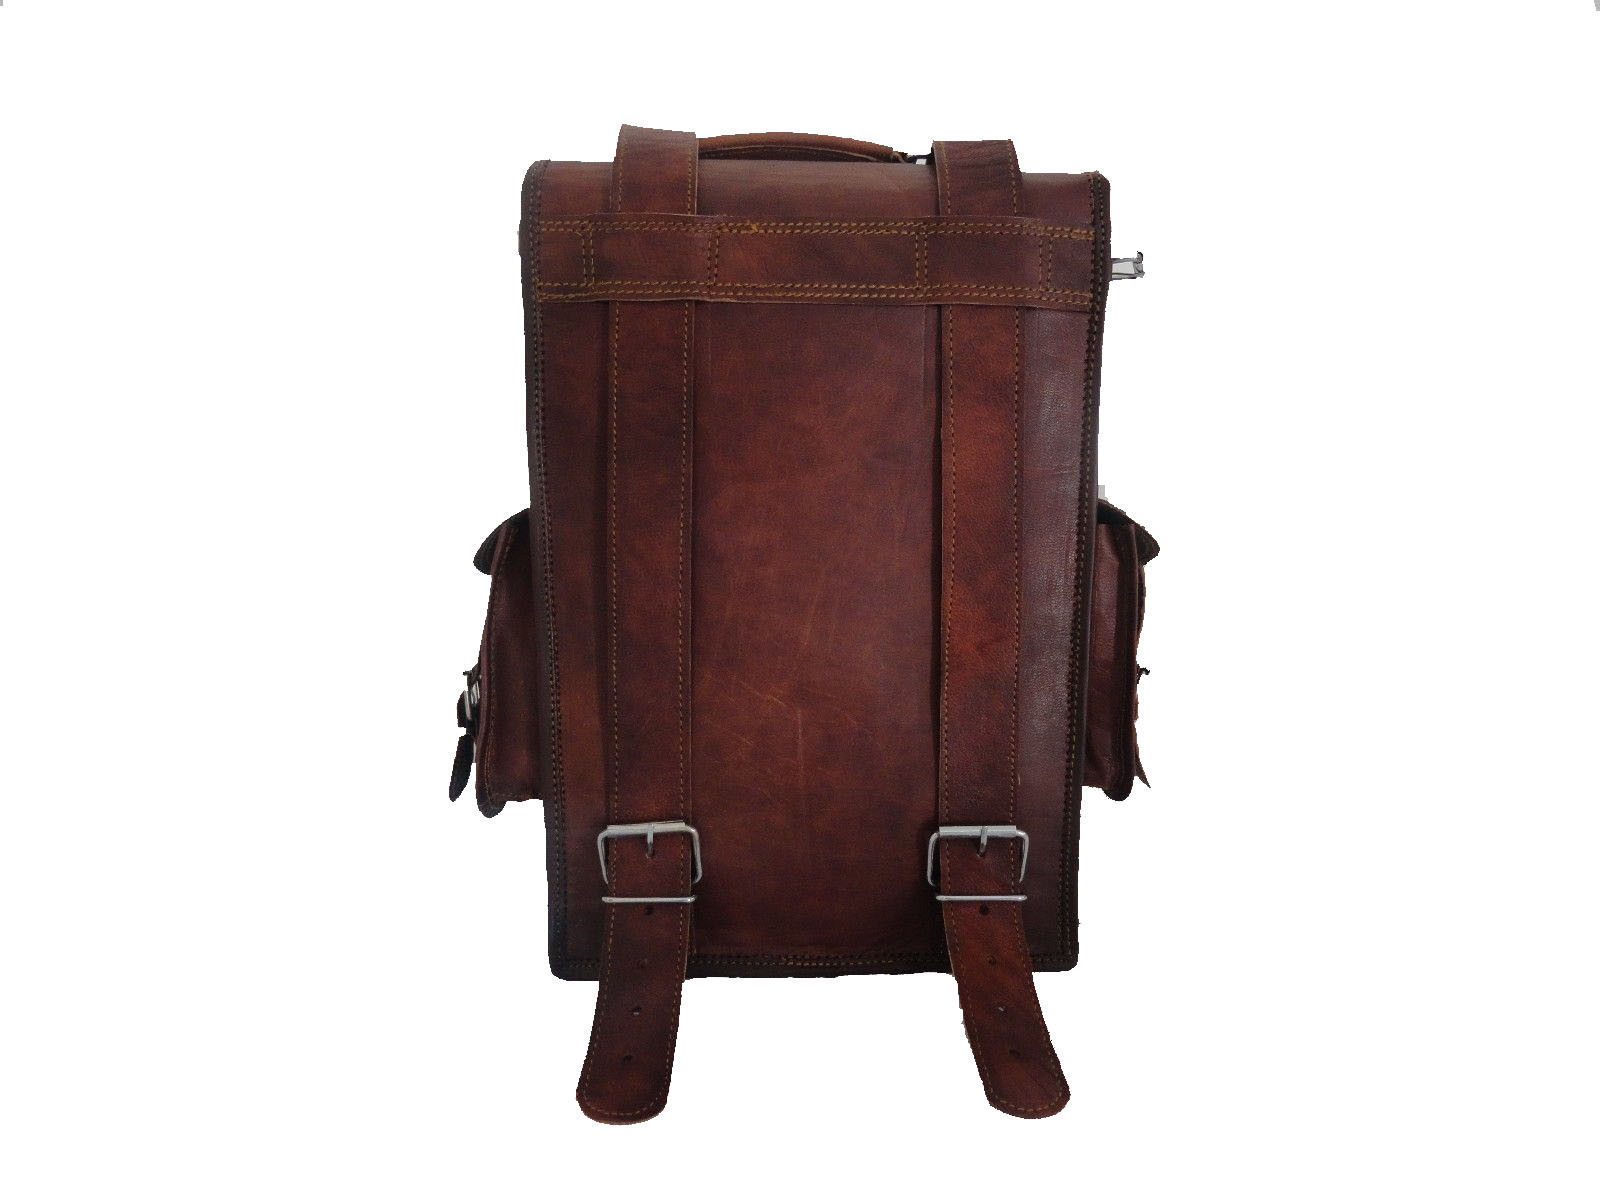 Men's vintage Leather backpack rucksack bag laptop casual travel school bags image 5